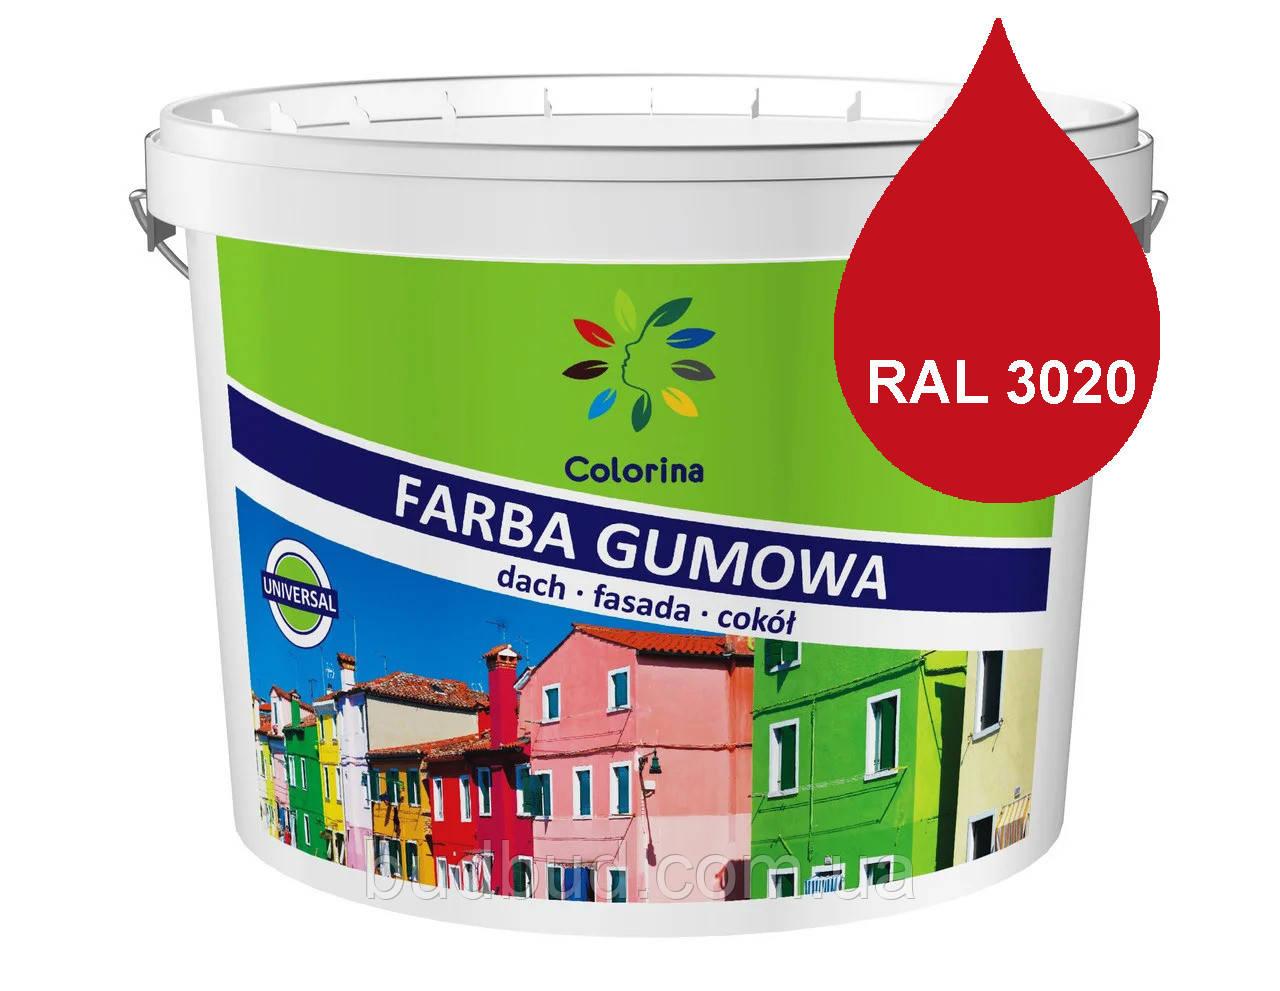 Фарба гумова червона RAL 3020 COLORINA  12 кг